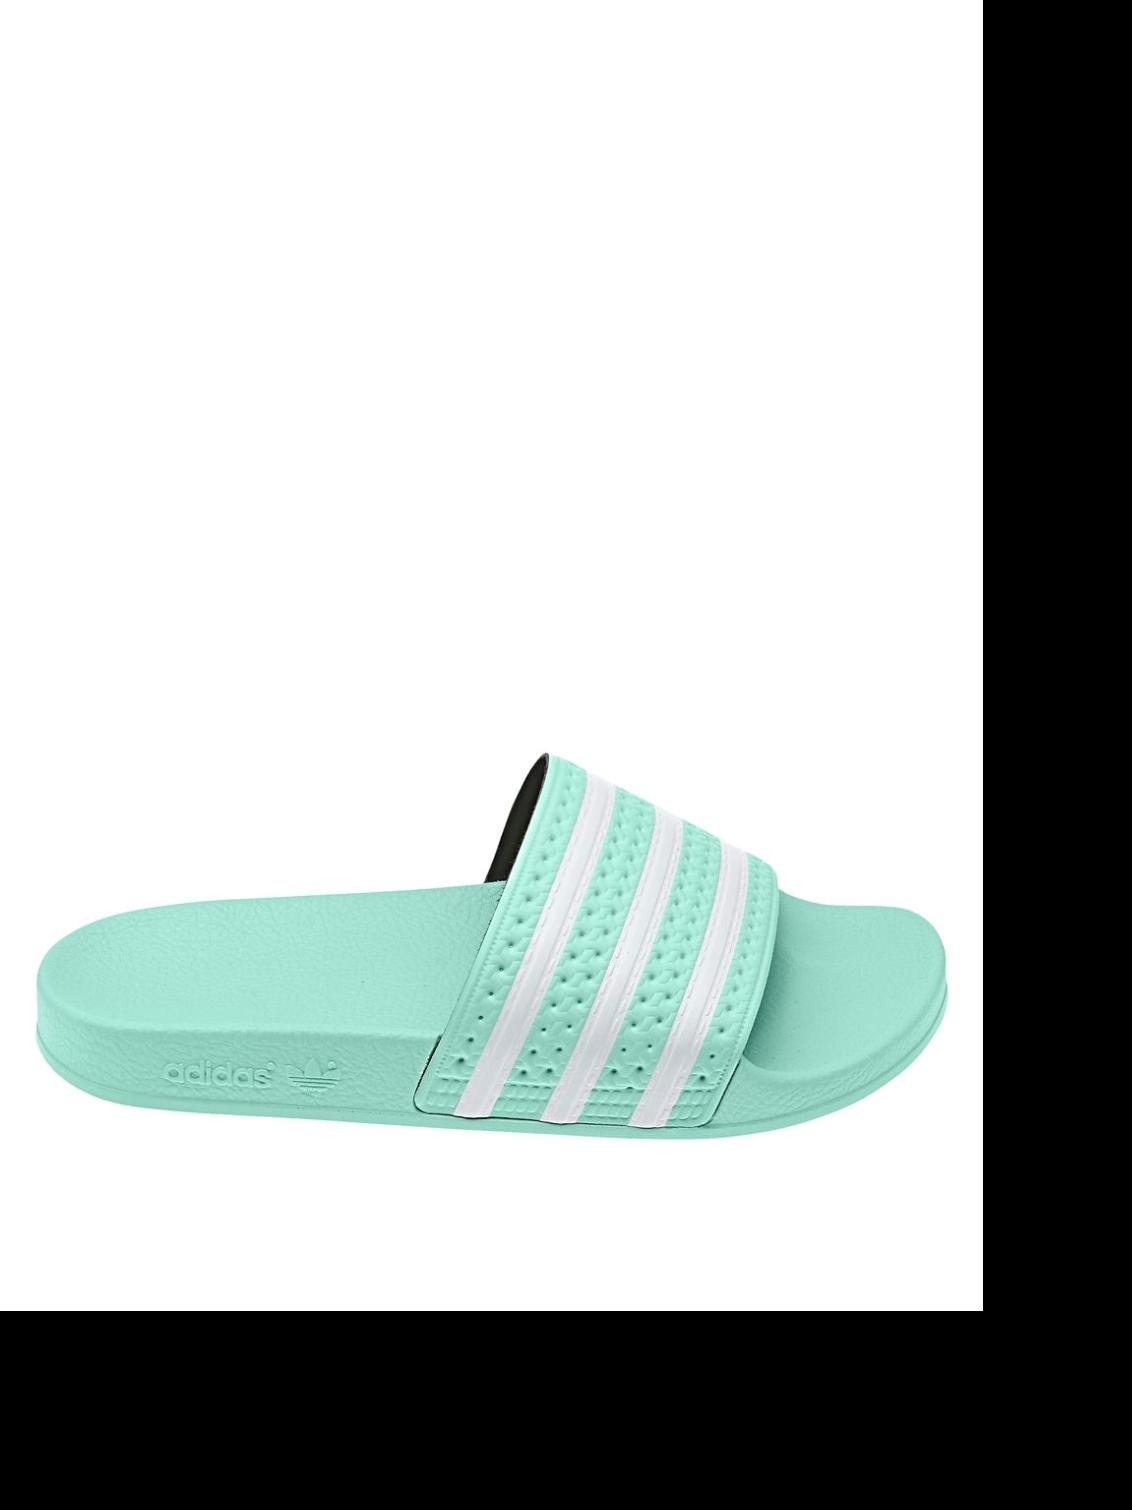 ADIDAS. Classic Striped Slides